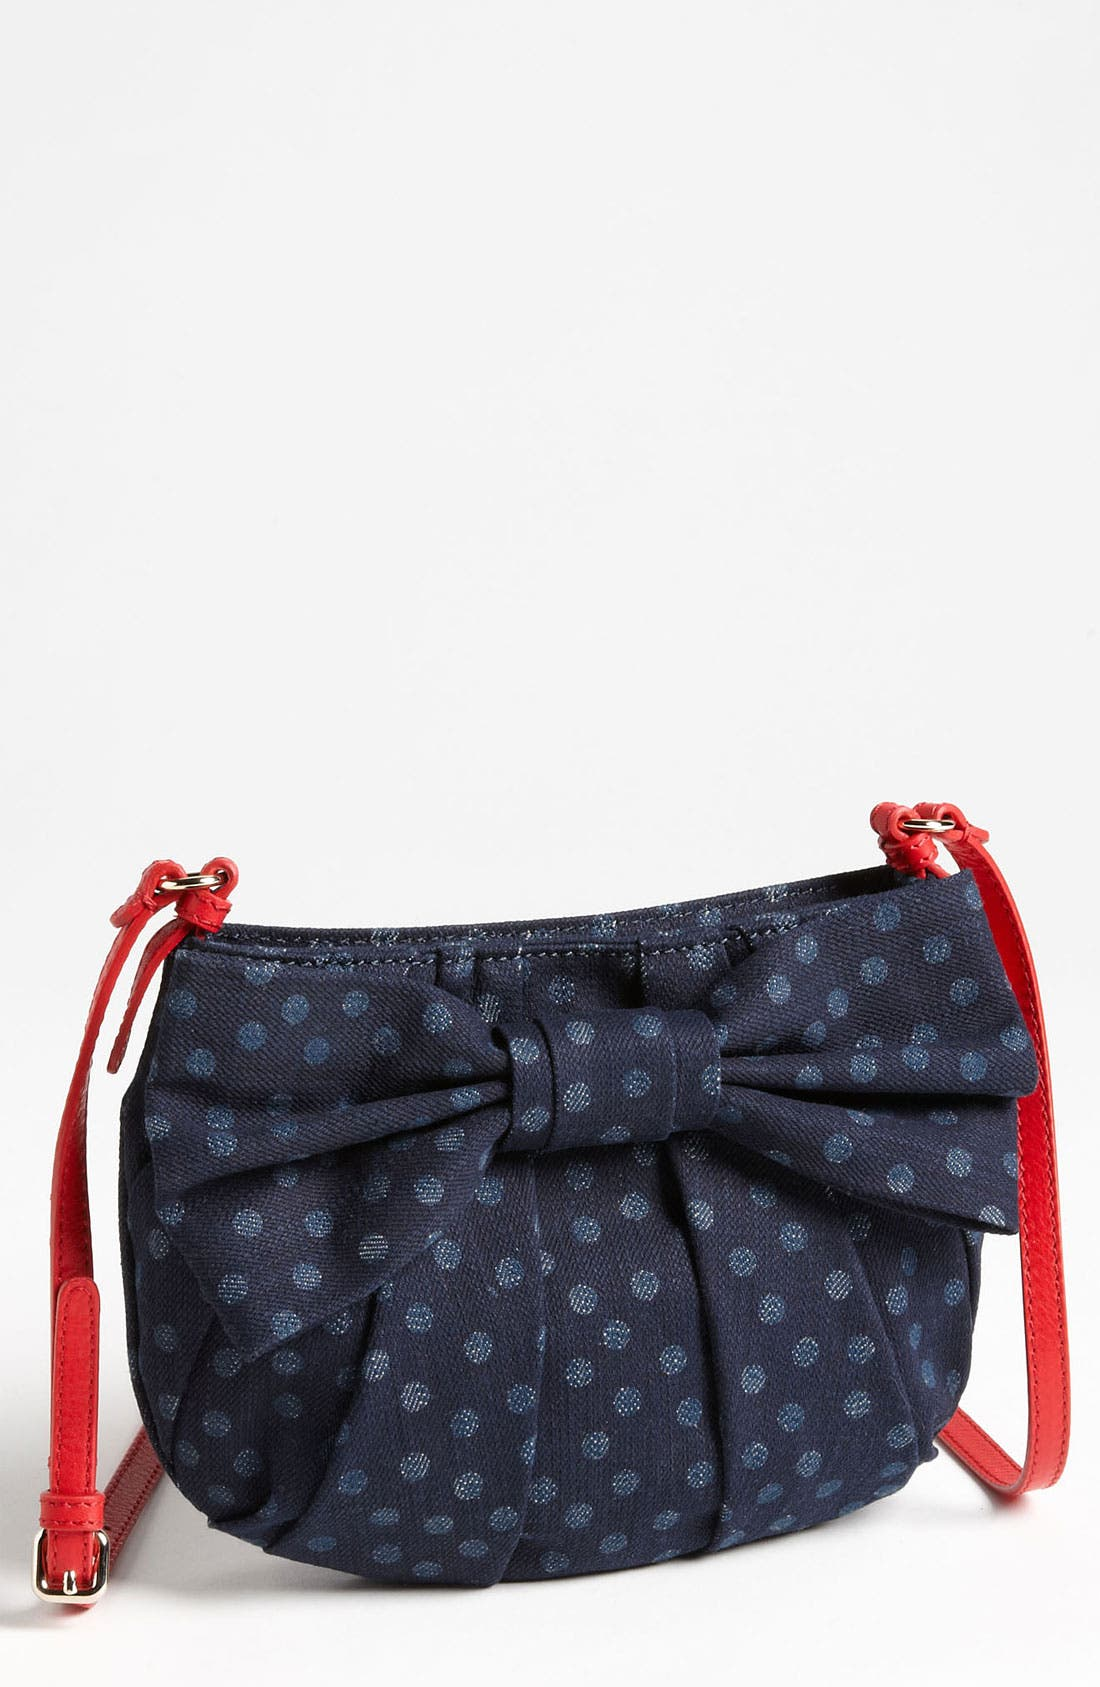 Main Image - RED Valentino 'Bow' Denim Crossbody Bag